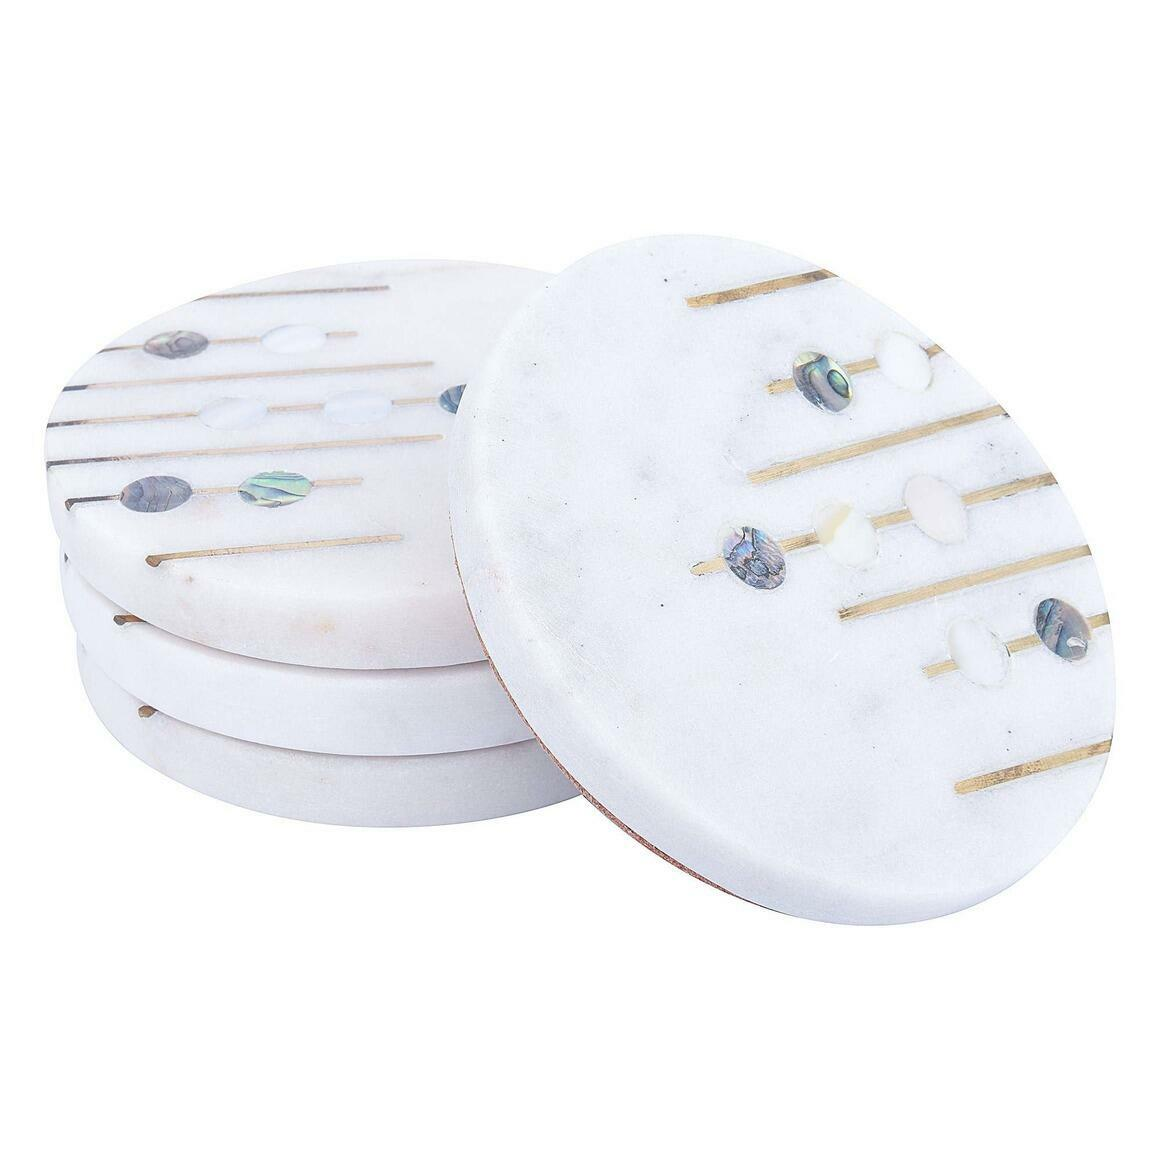 Abruzzo White Marble Coasters (Set of 4)   Trada Marketplace